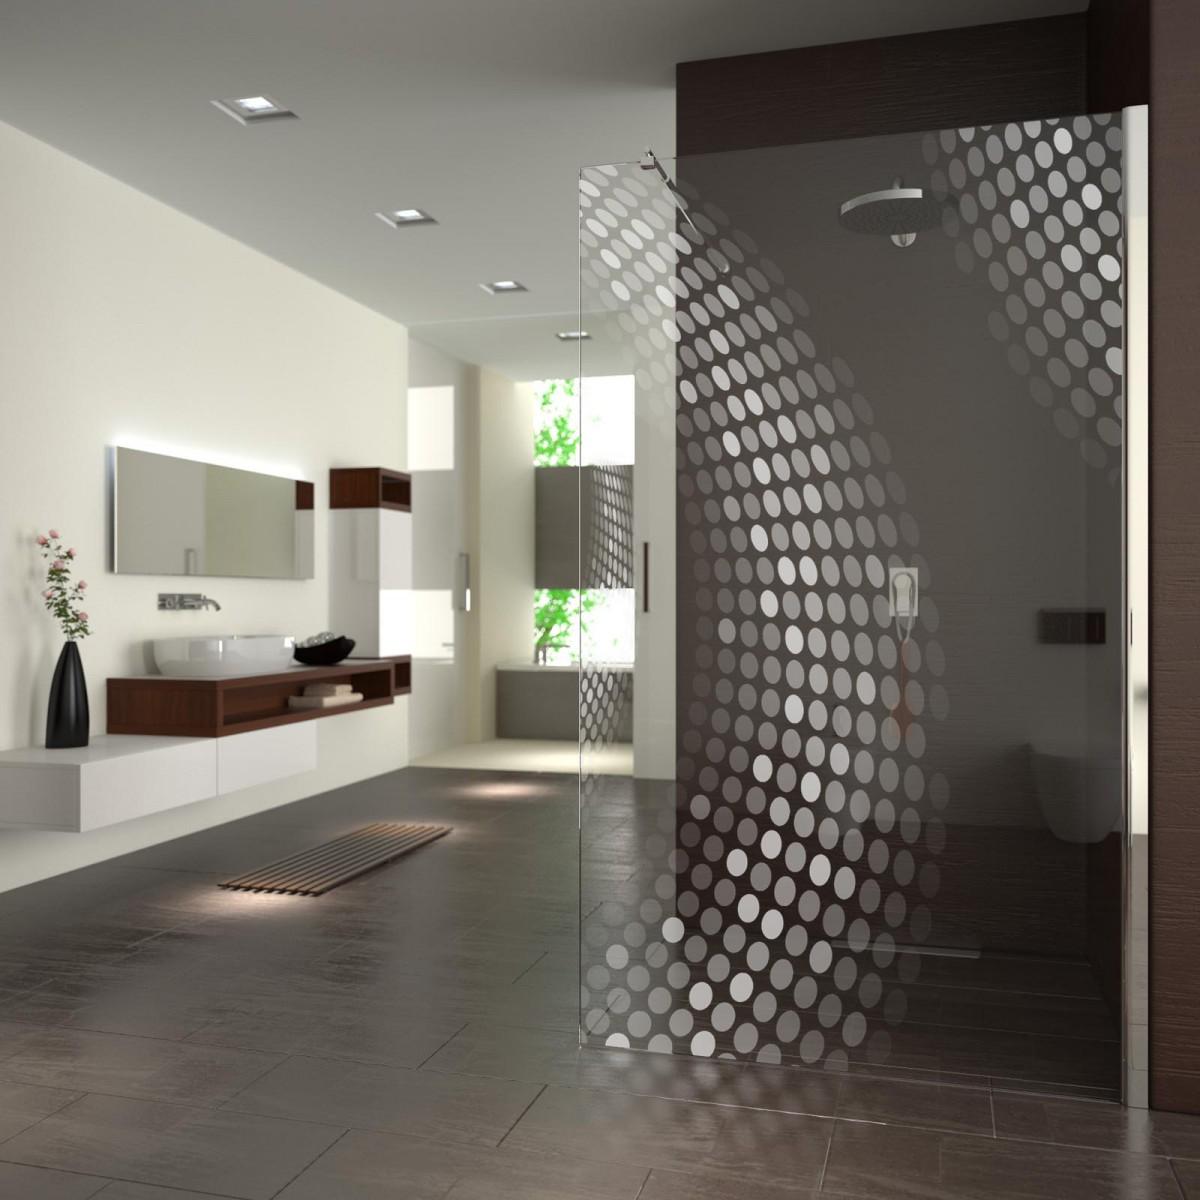 walk in dusche eckernf rde 989704977. Black Bedroom Furniture Sets. Home Design Ideas